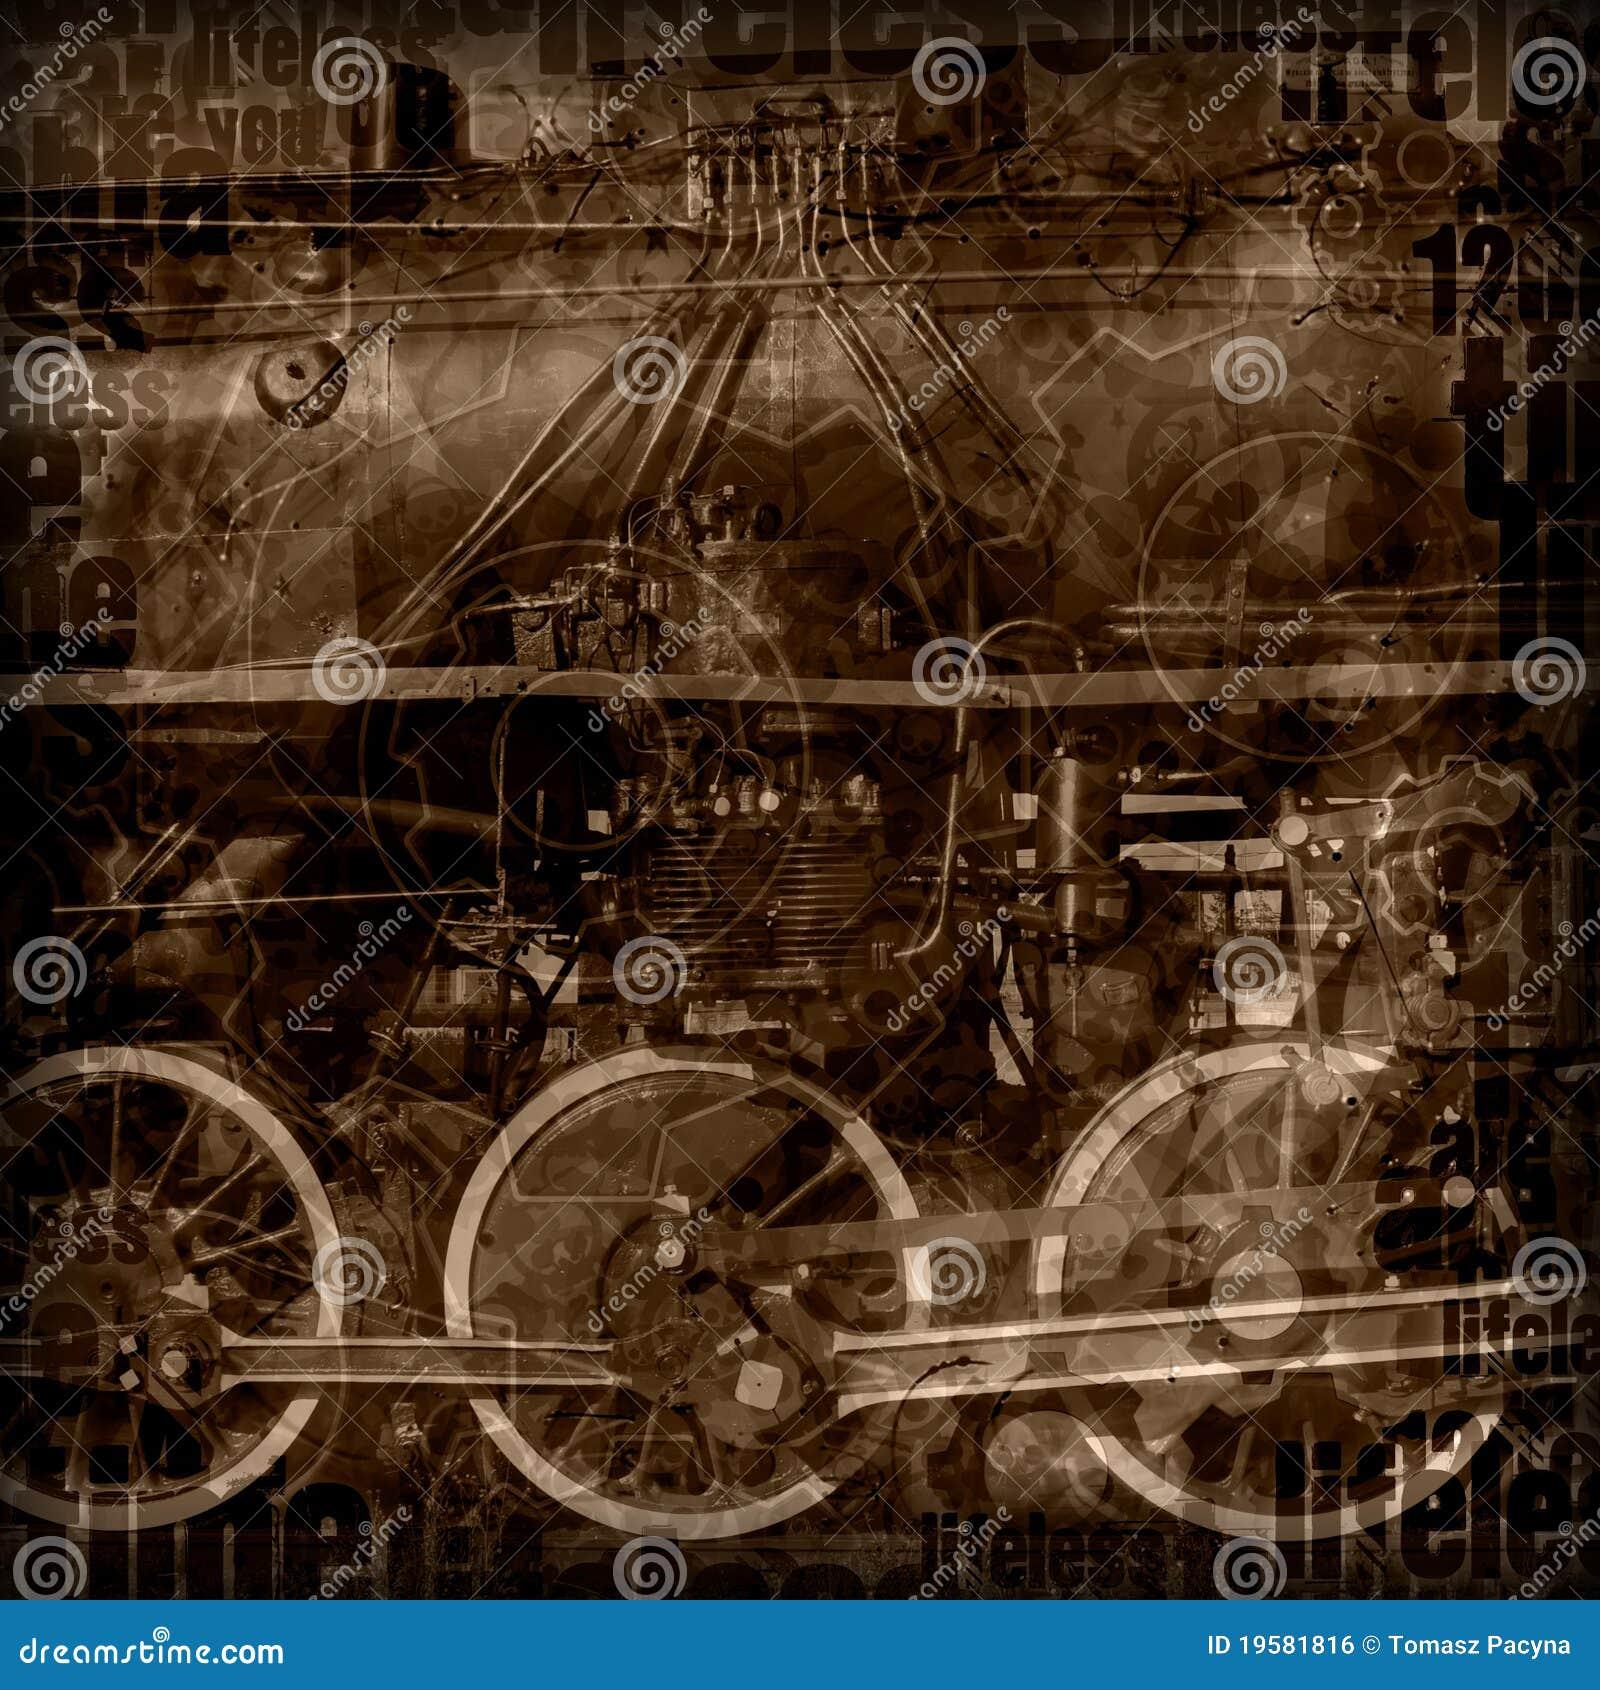 Steampunk Machinery Illustration Stock Illustration ...